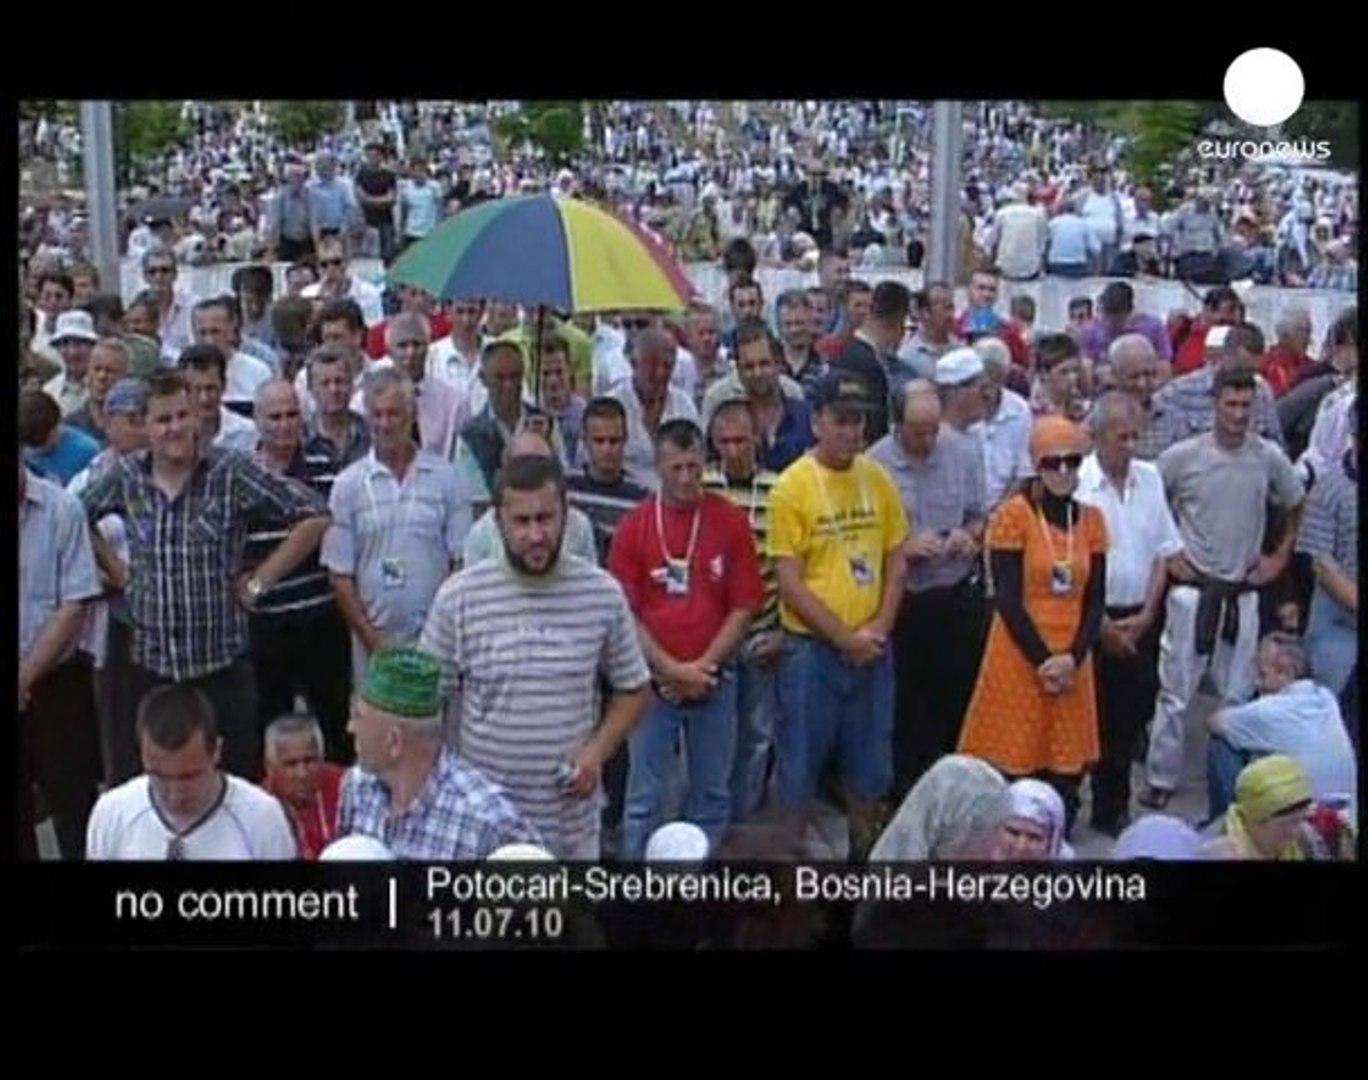 Bosnia marks Srebrenica massacre - no comment